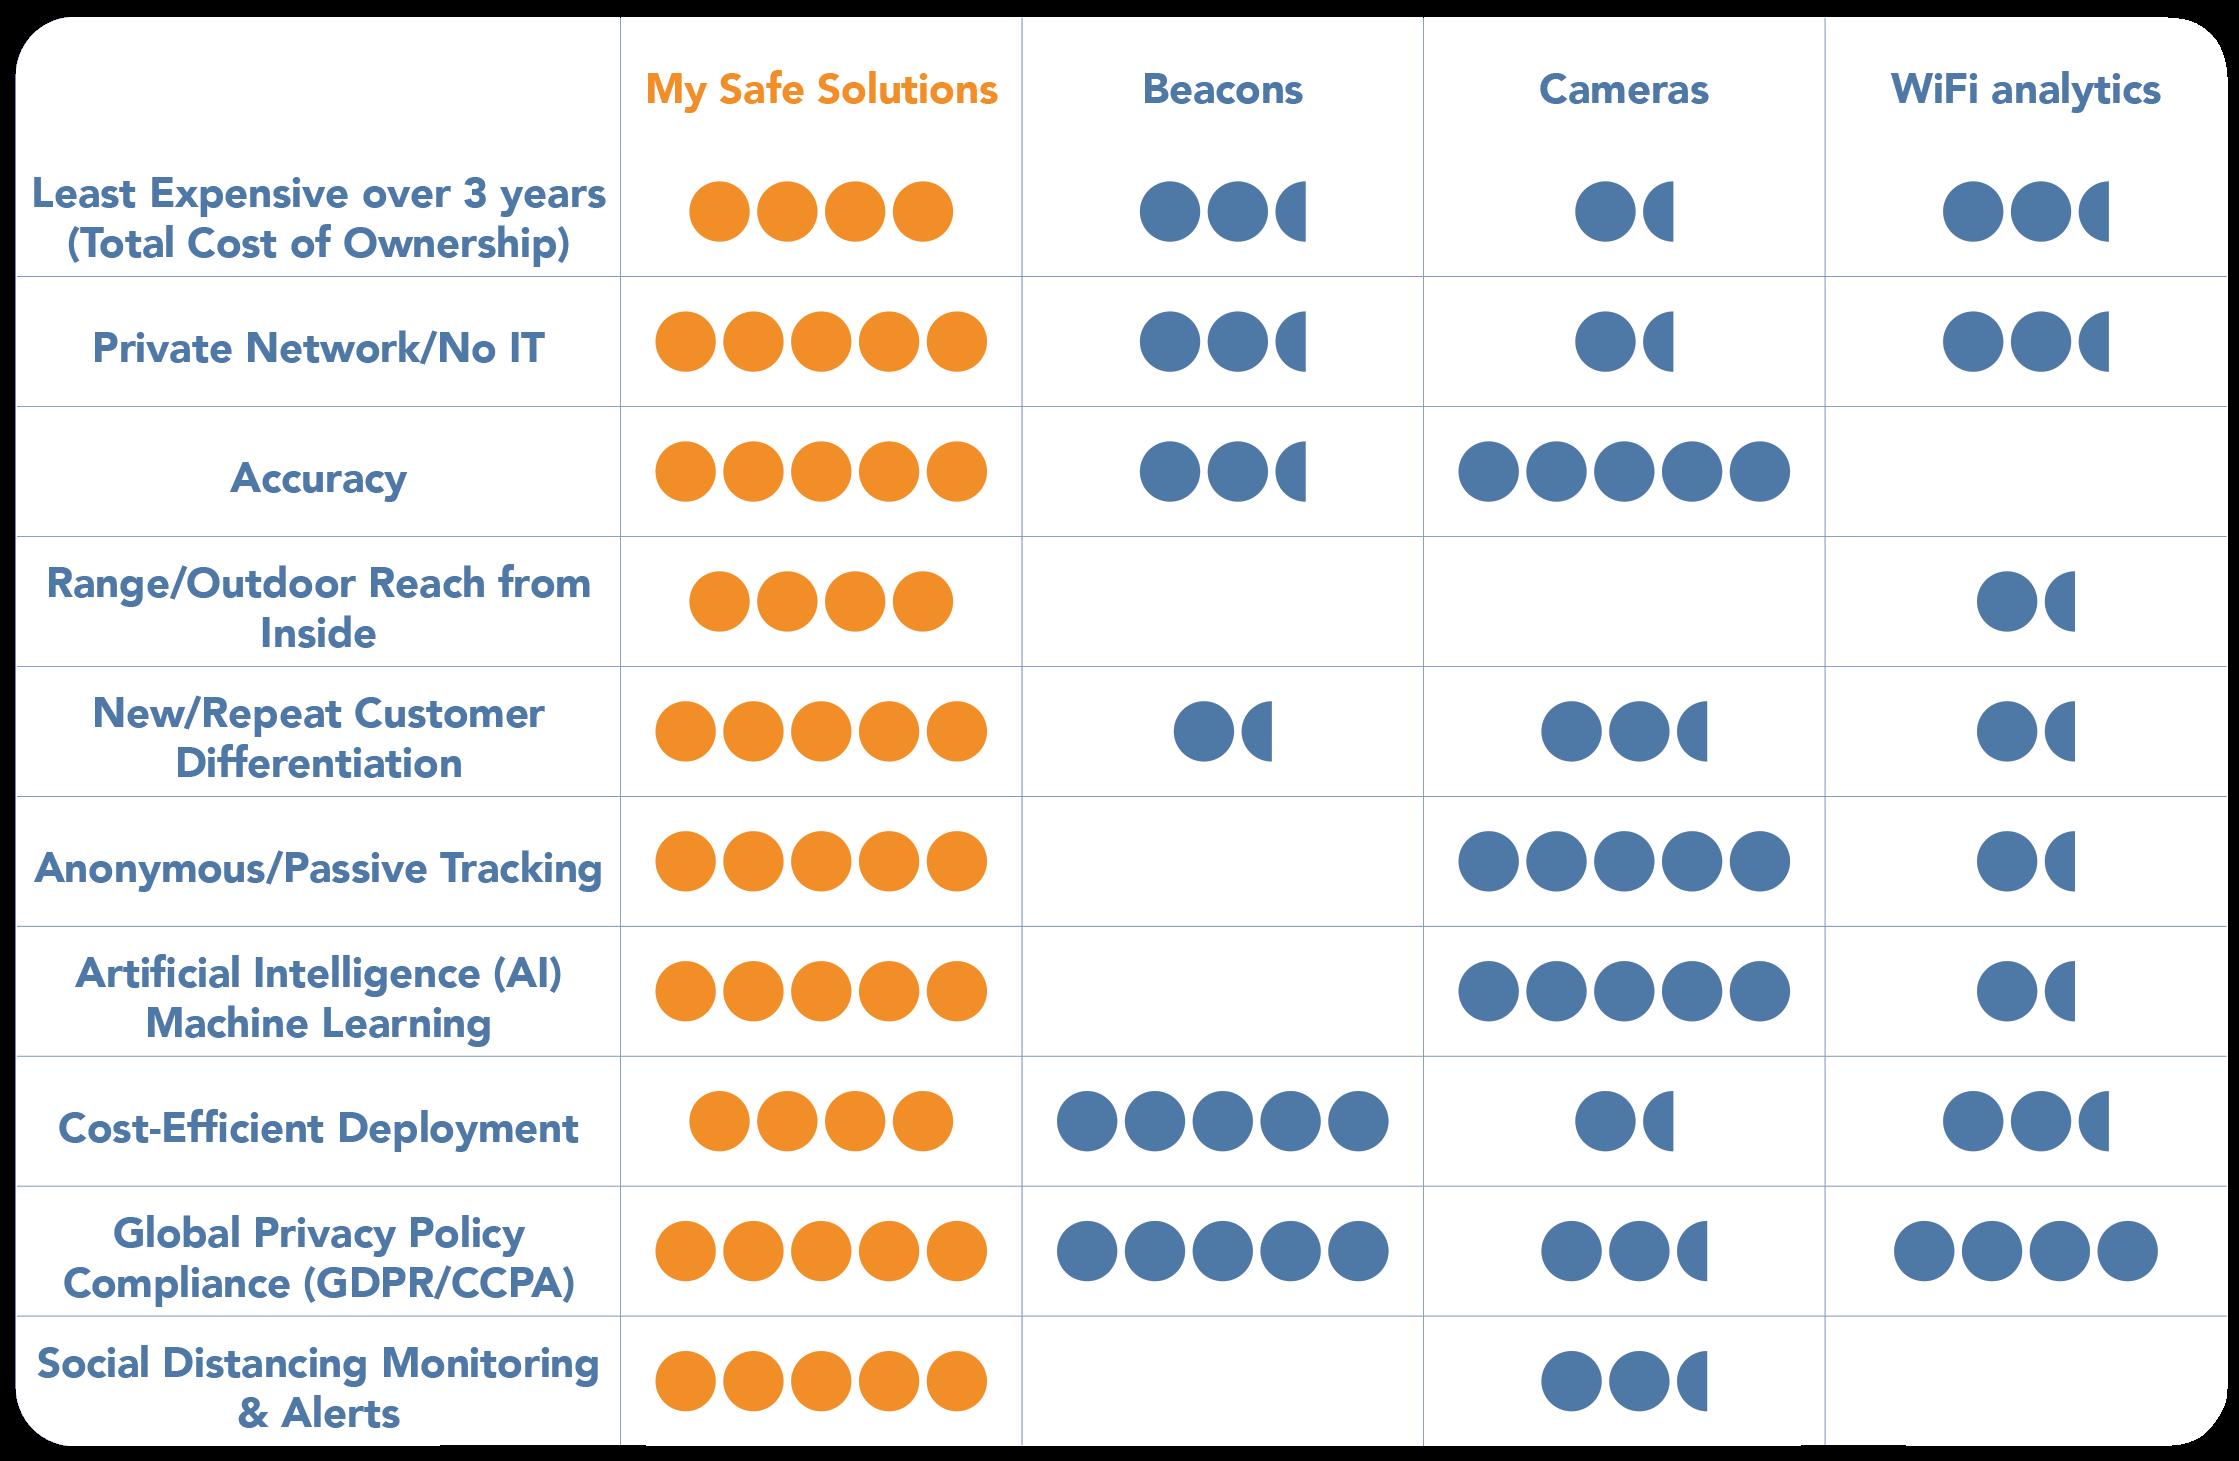 My Safe Solutions: Best practice system comparison